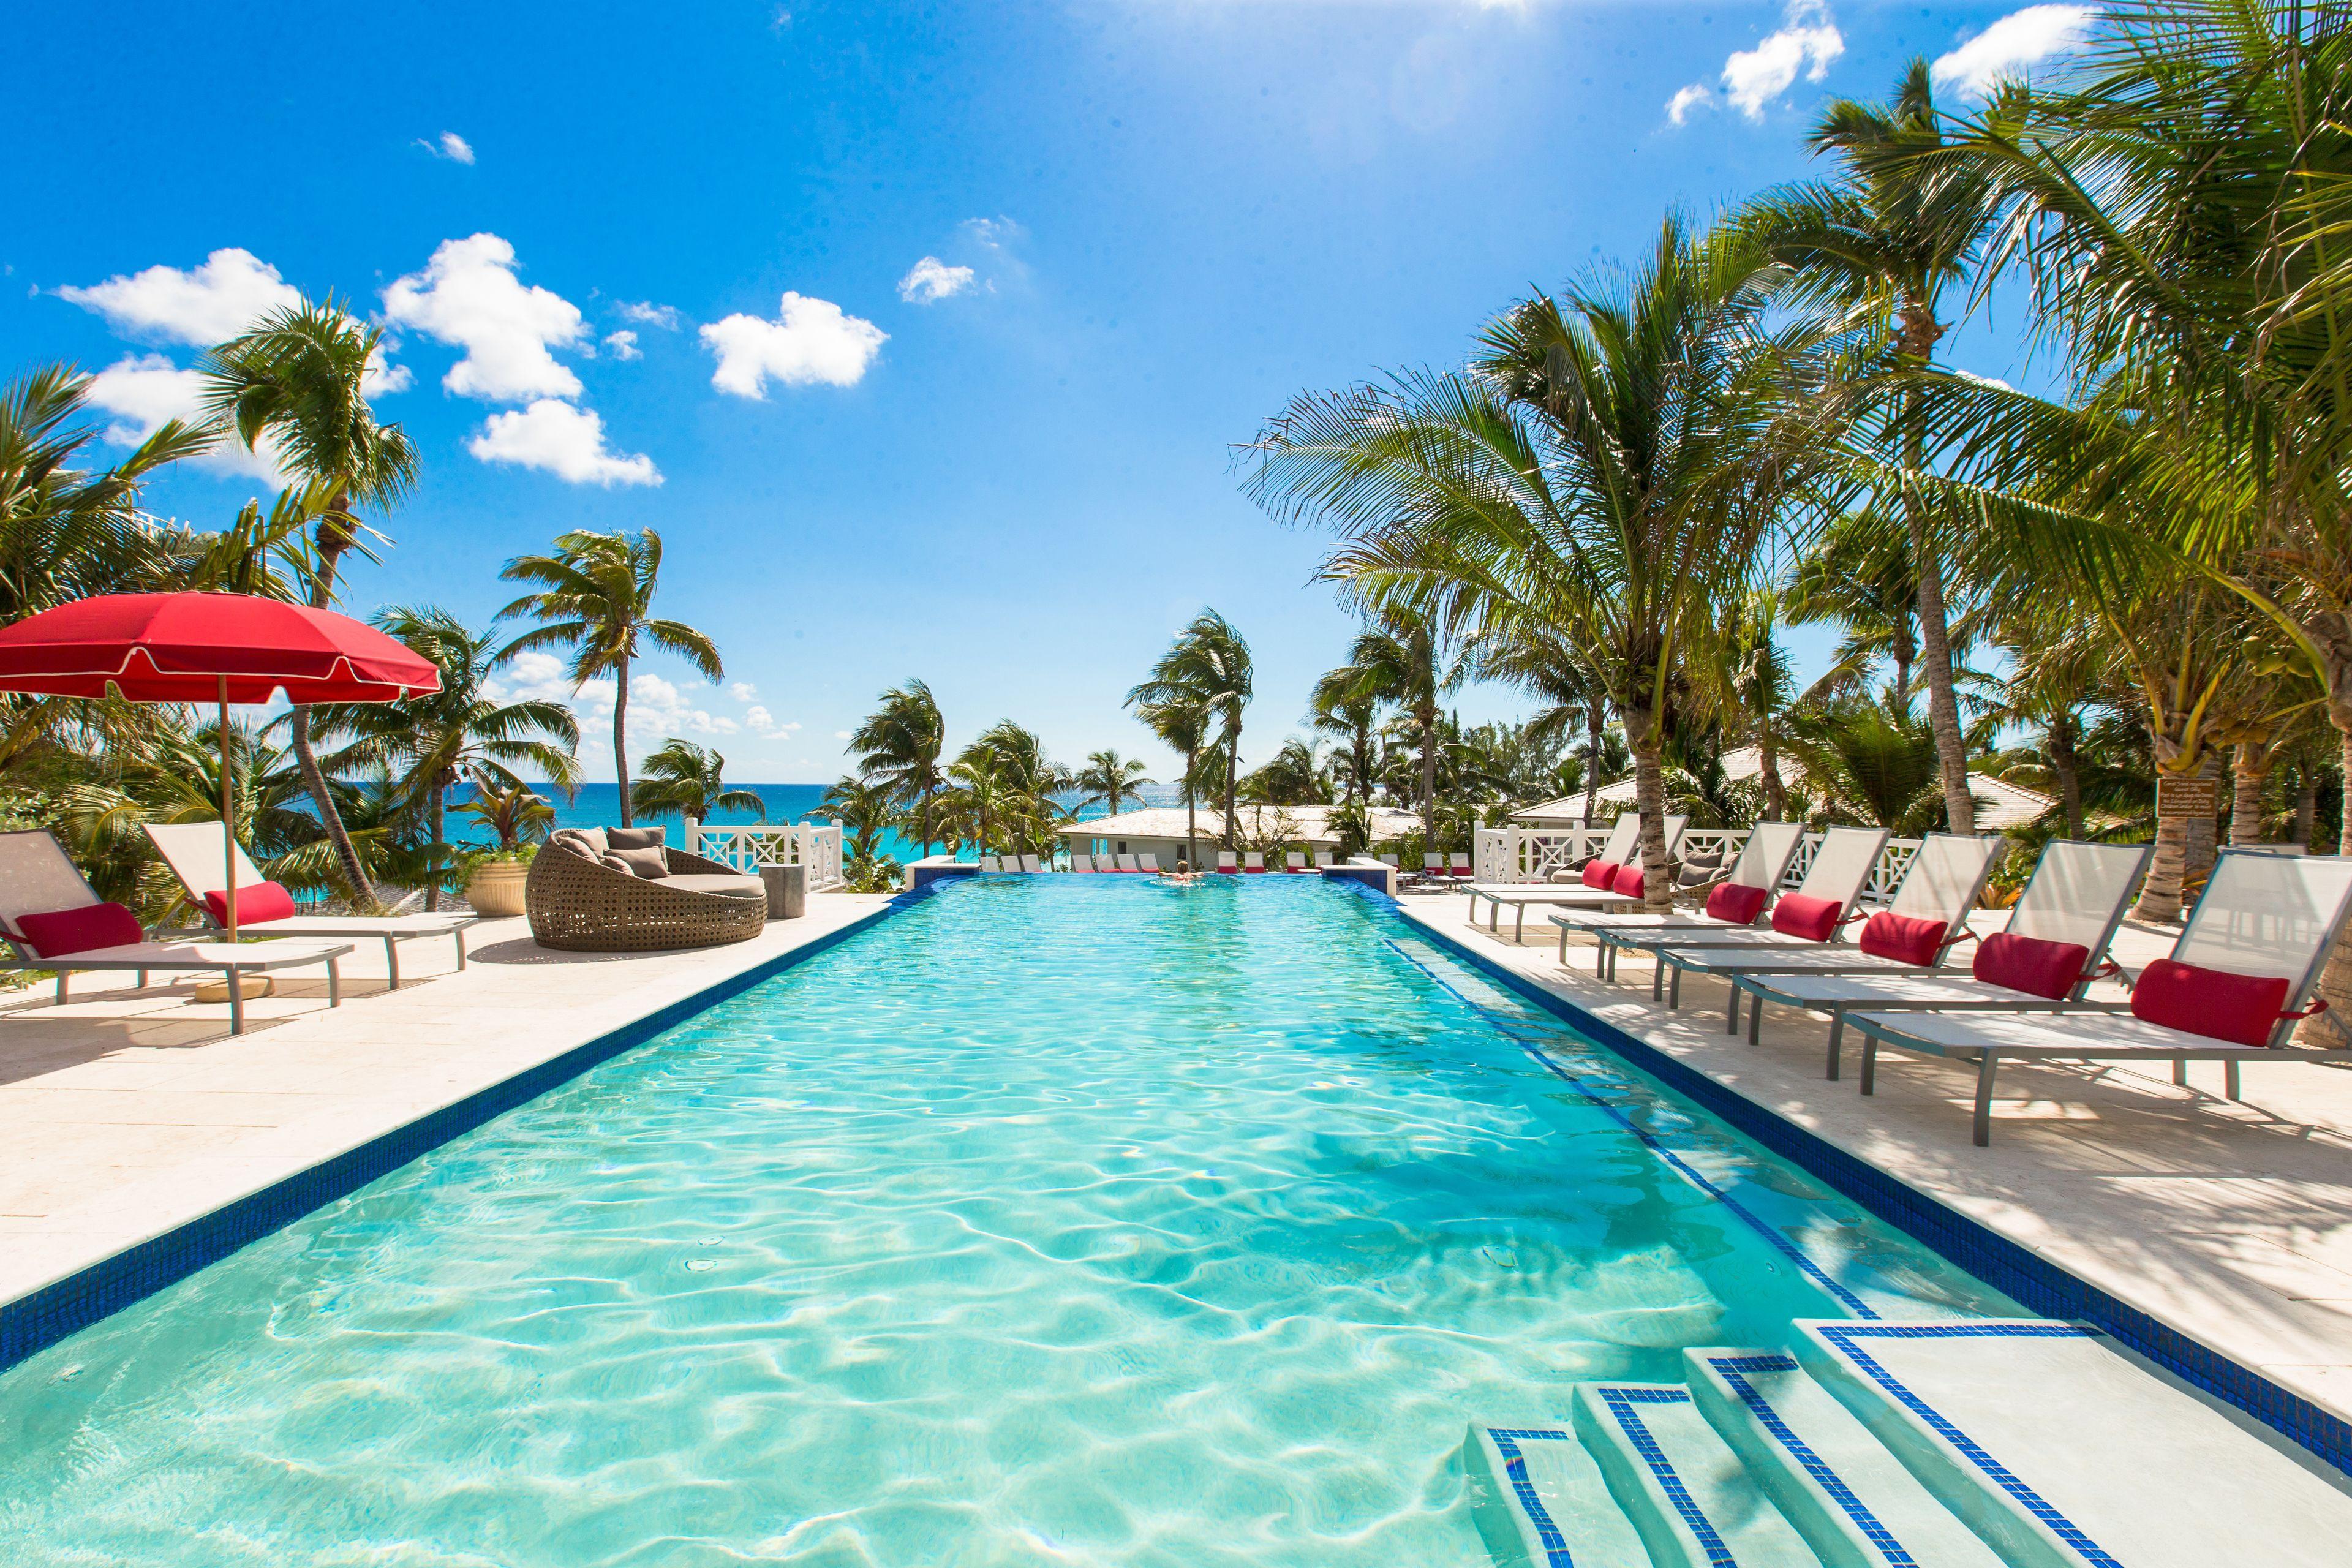 Courtesy of Coral Sands Hotel / Expedia.com